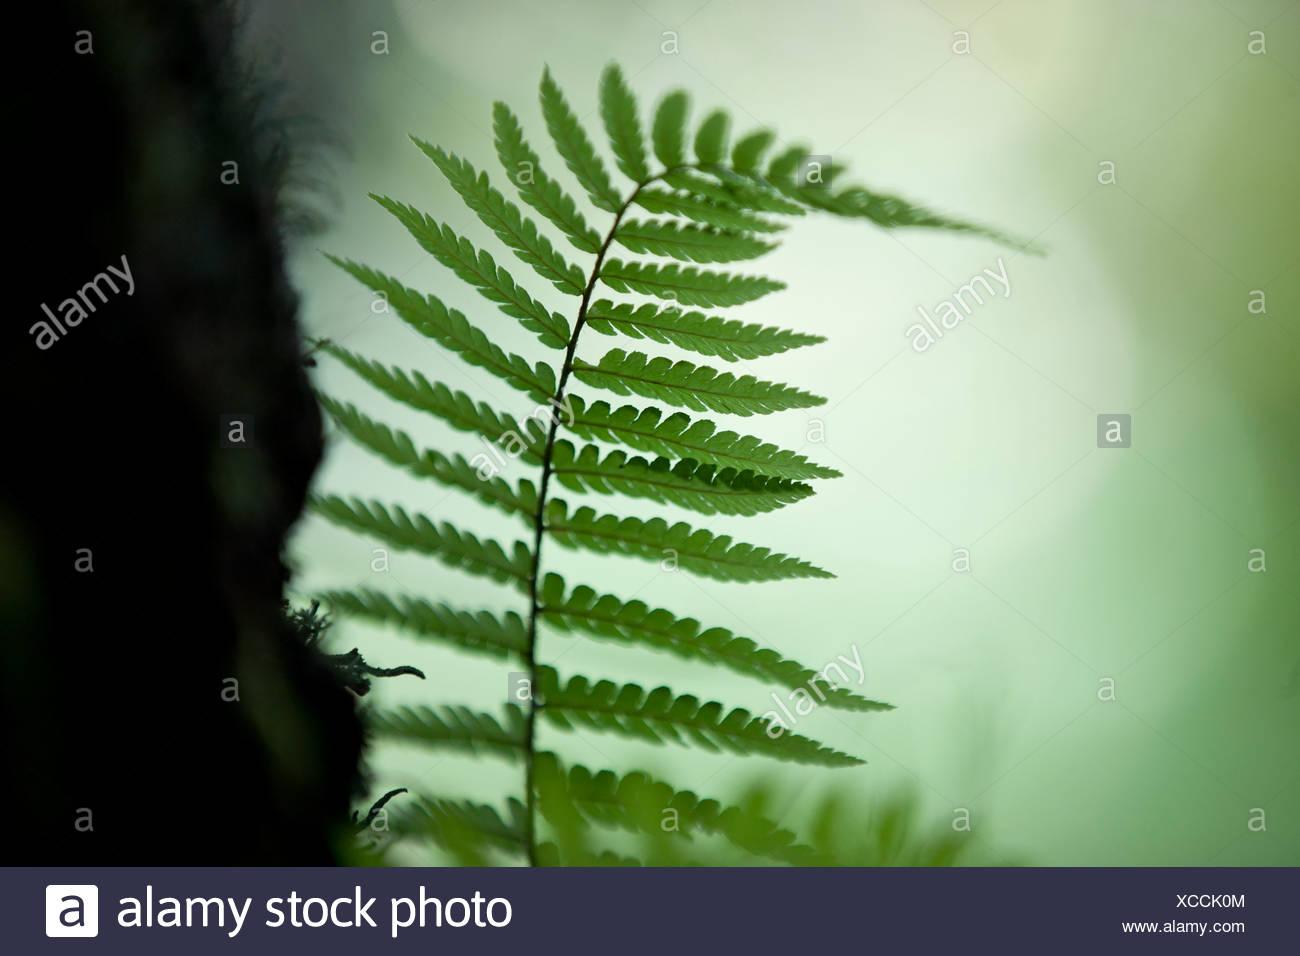 Fern tree leaves - Stock Image